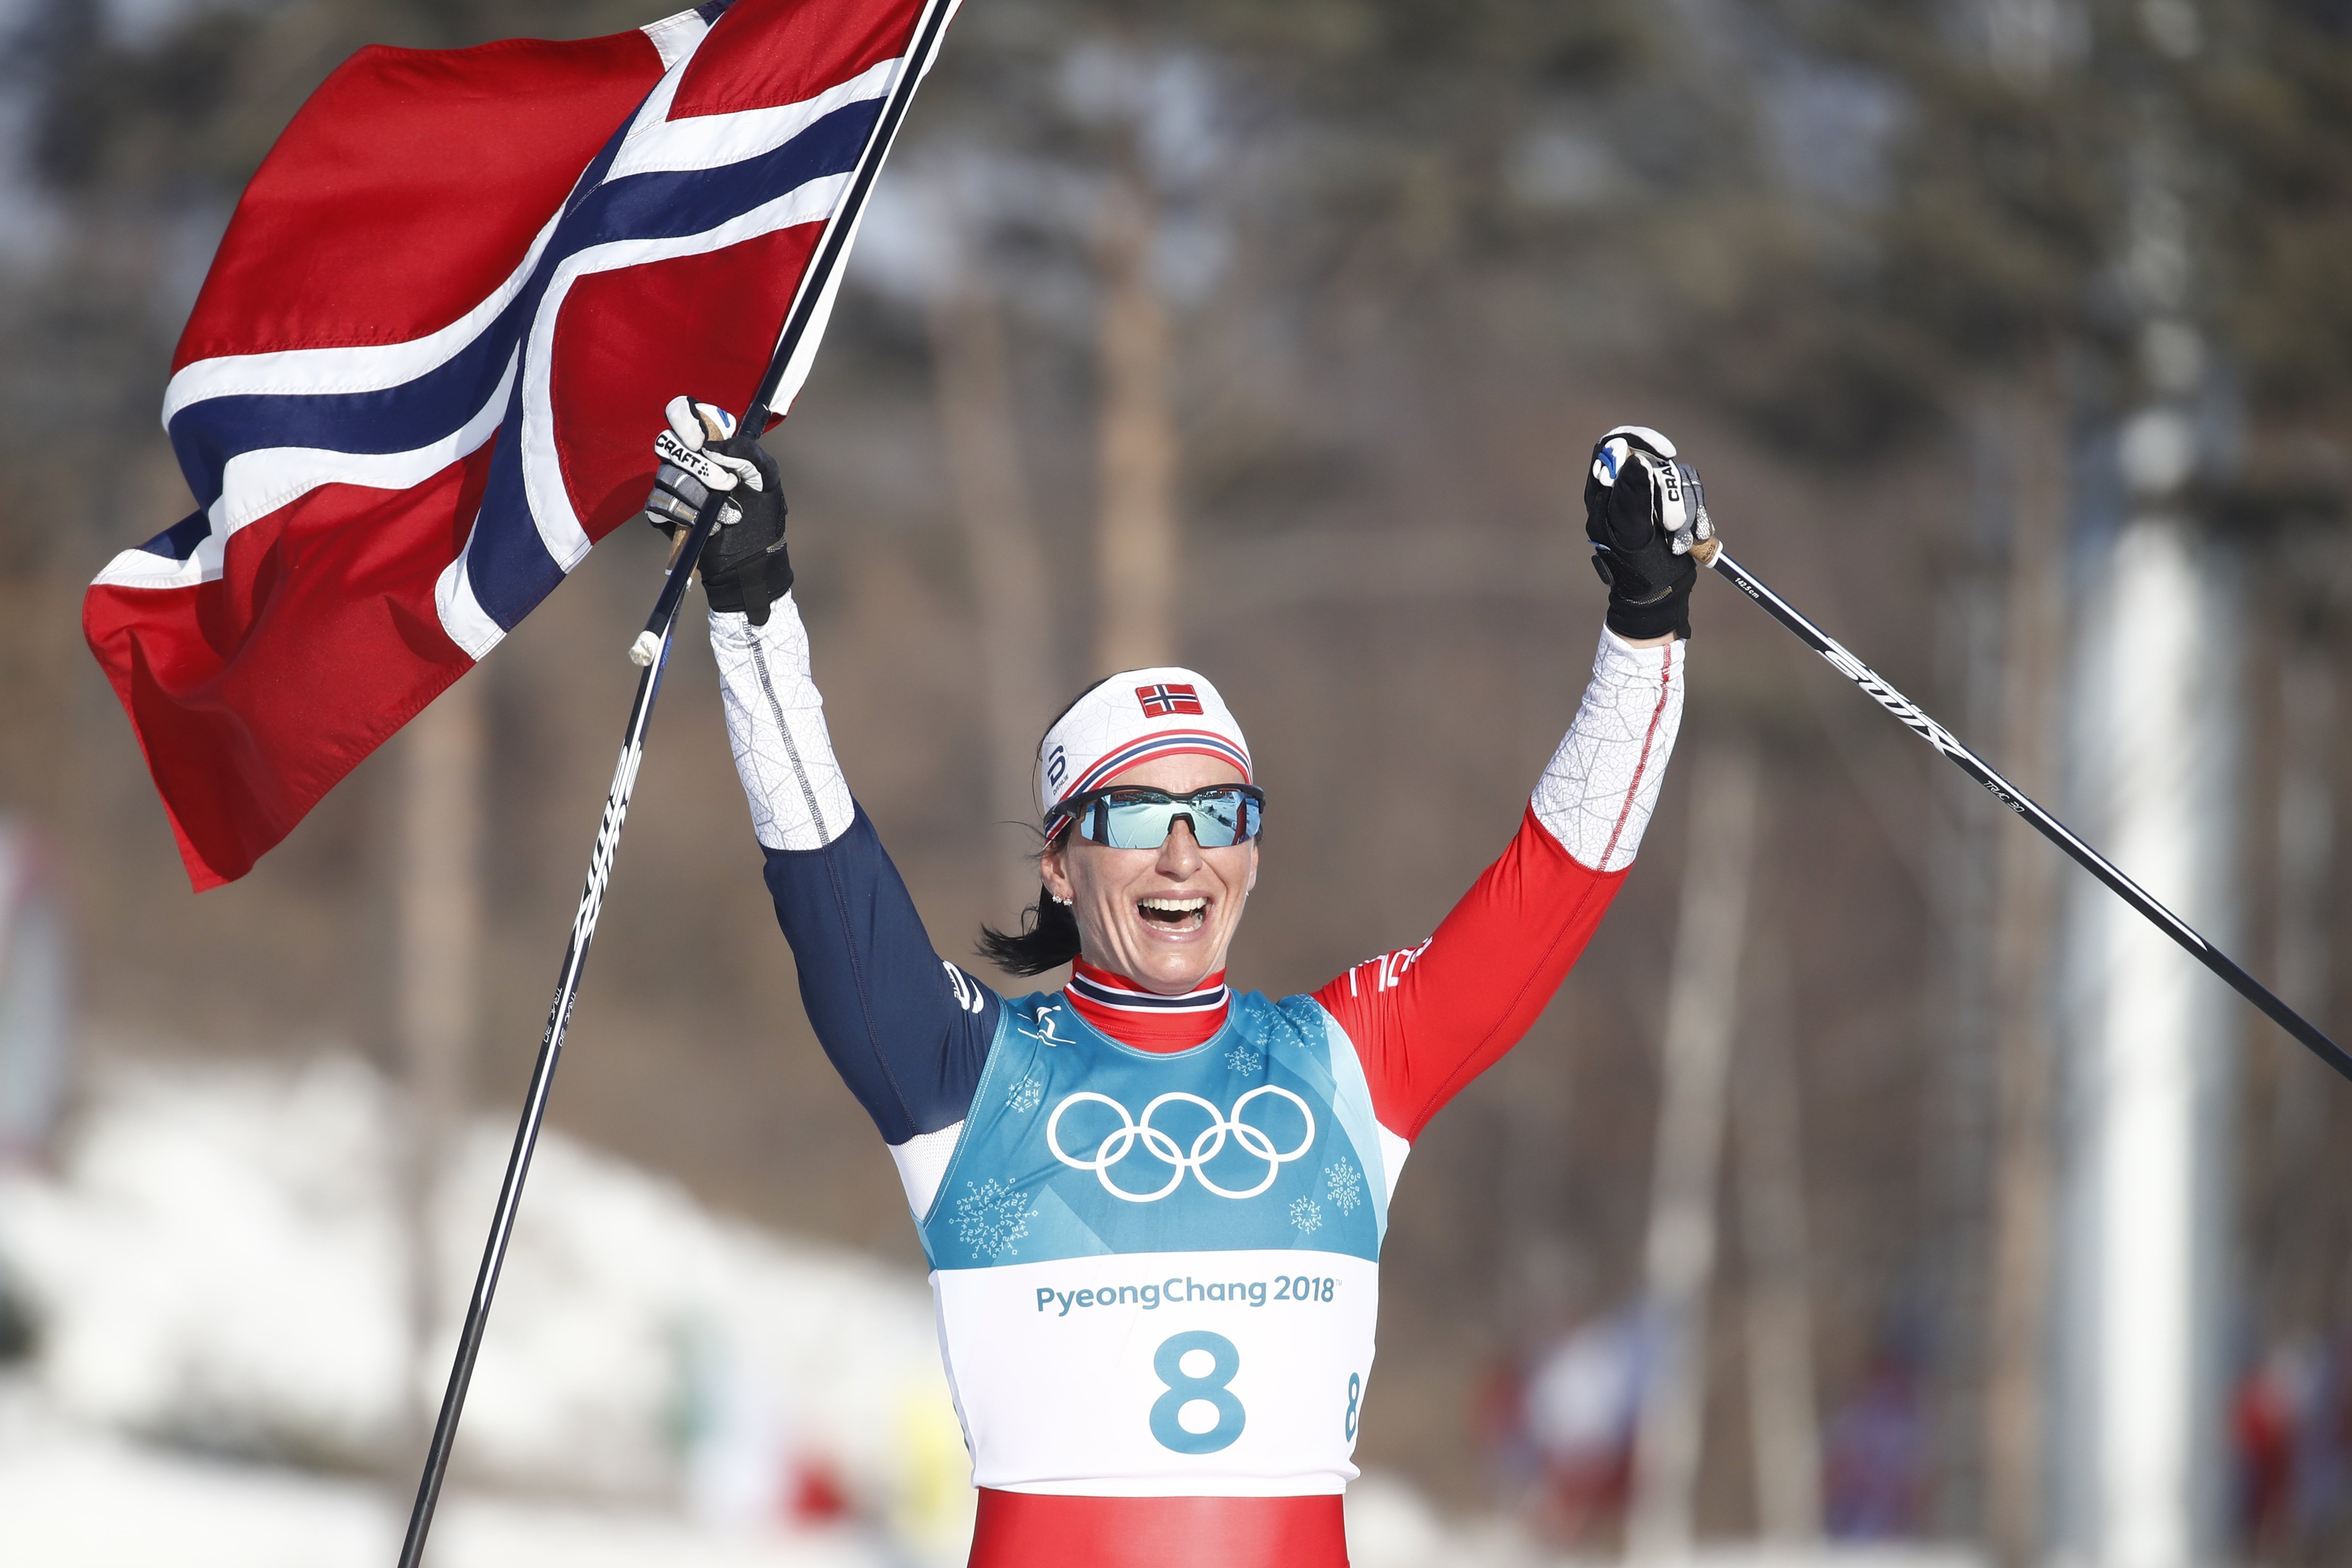 Winter Olympics: Marit Bjoergen puts Norway top of the medals table